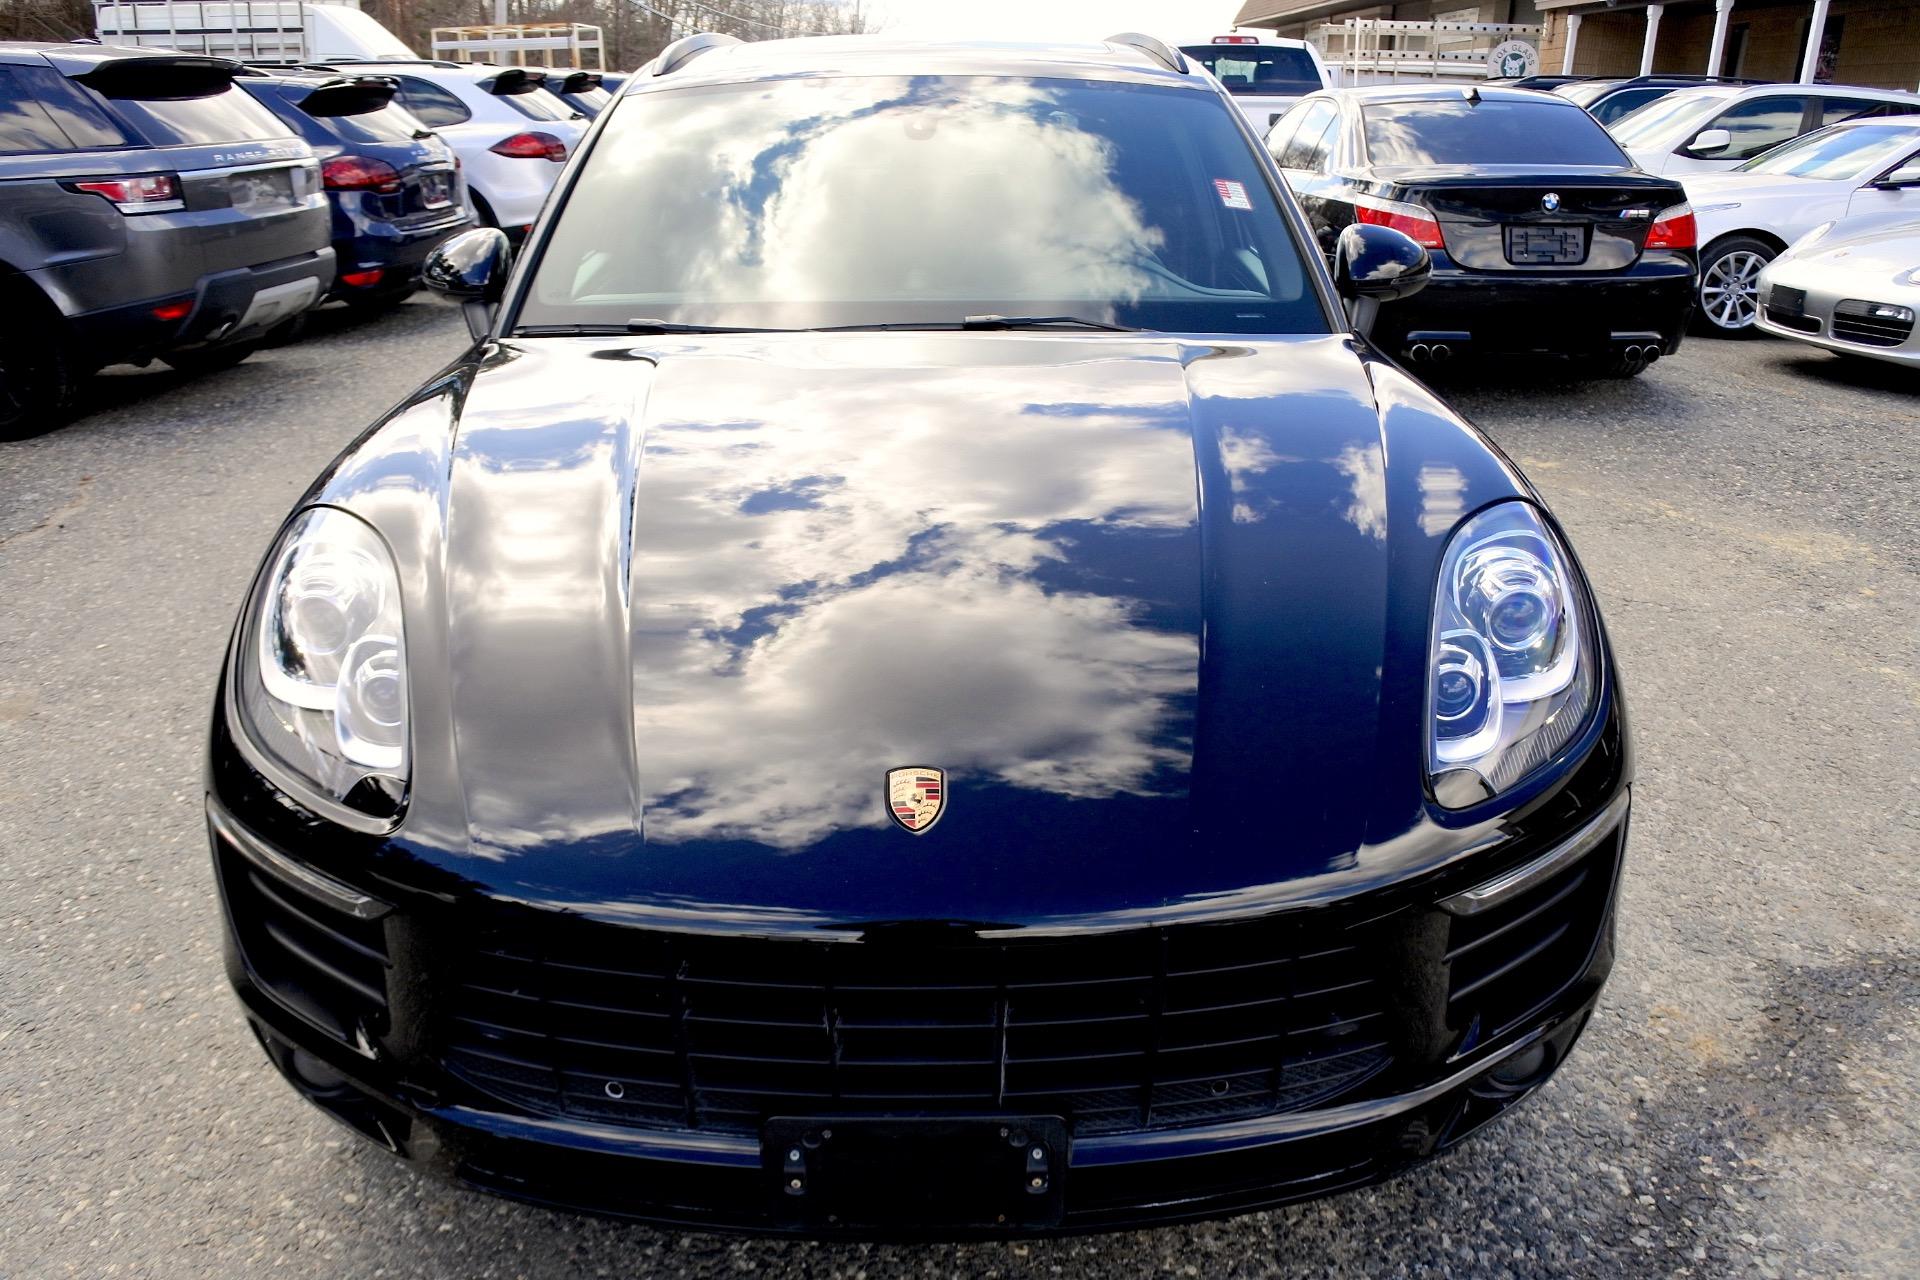 Used 2017 Porsche Macan AWD Used 2017 Porsche Macan AWD for sale  at Metro West Motorcars LLC in Shrewsbury MA 8